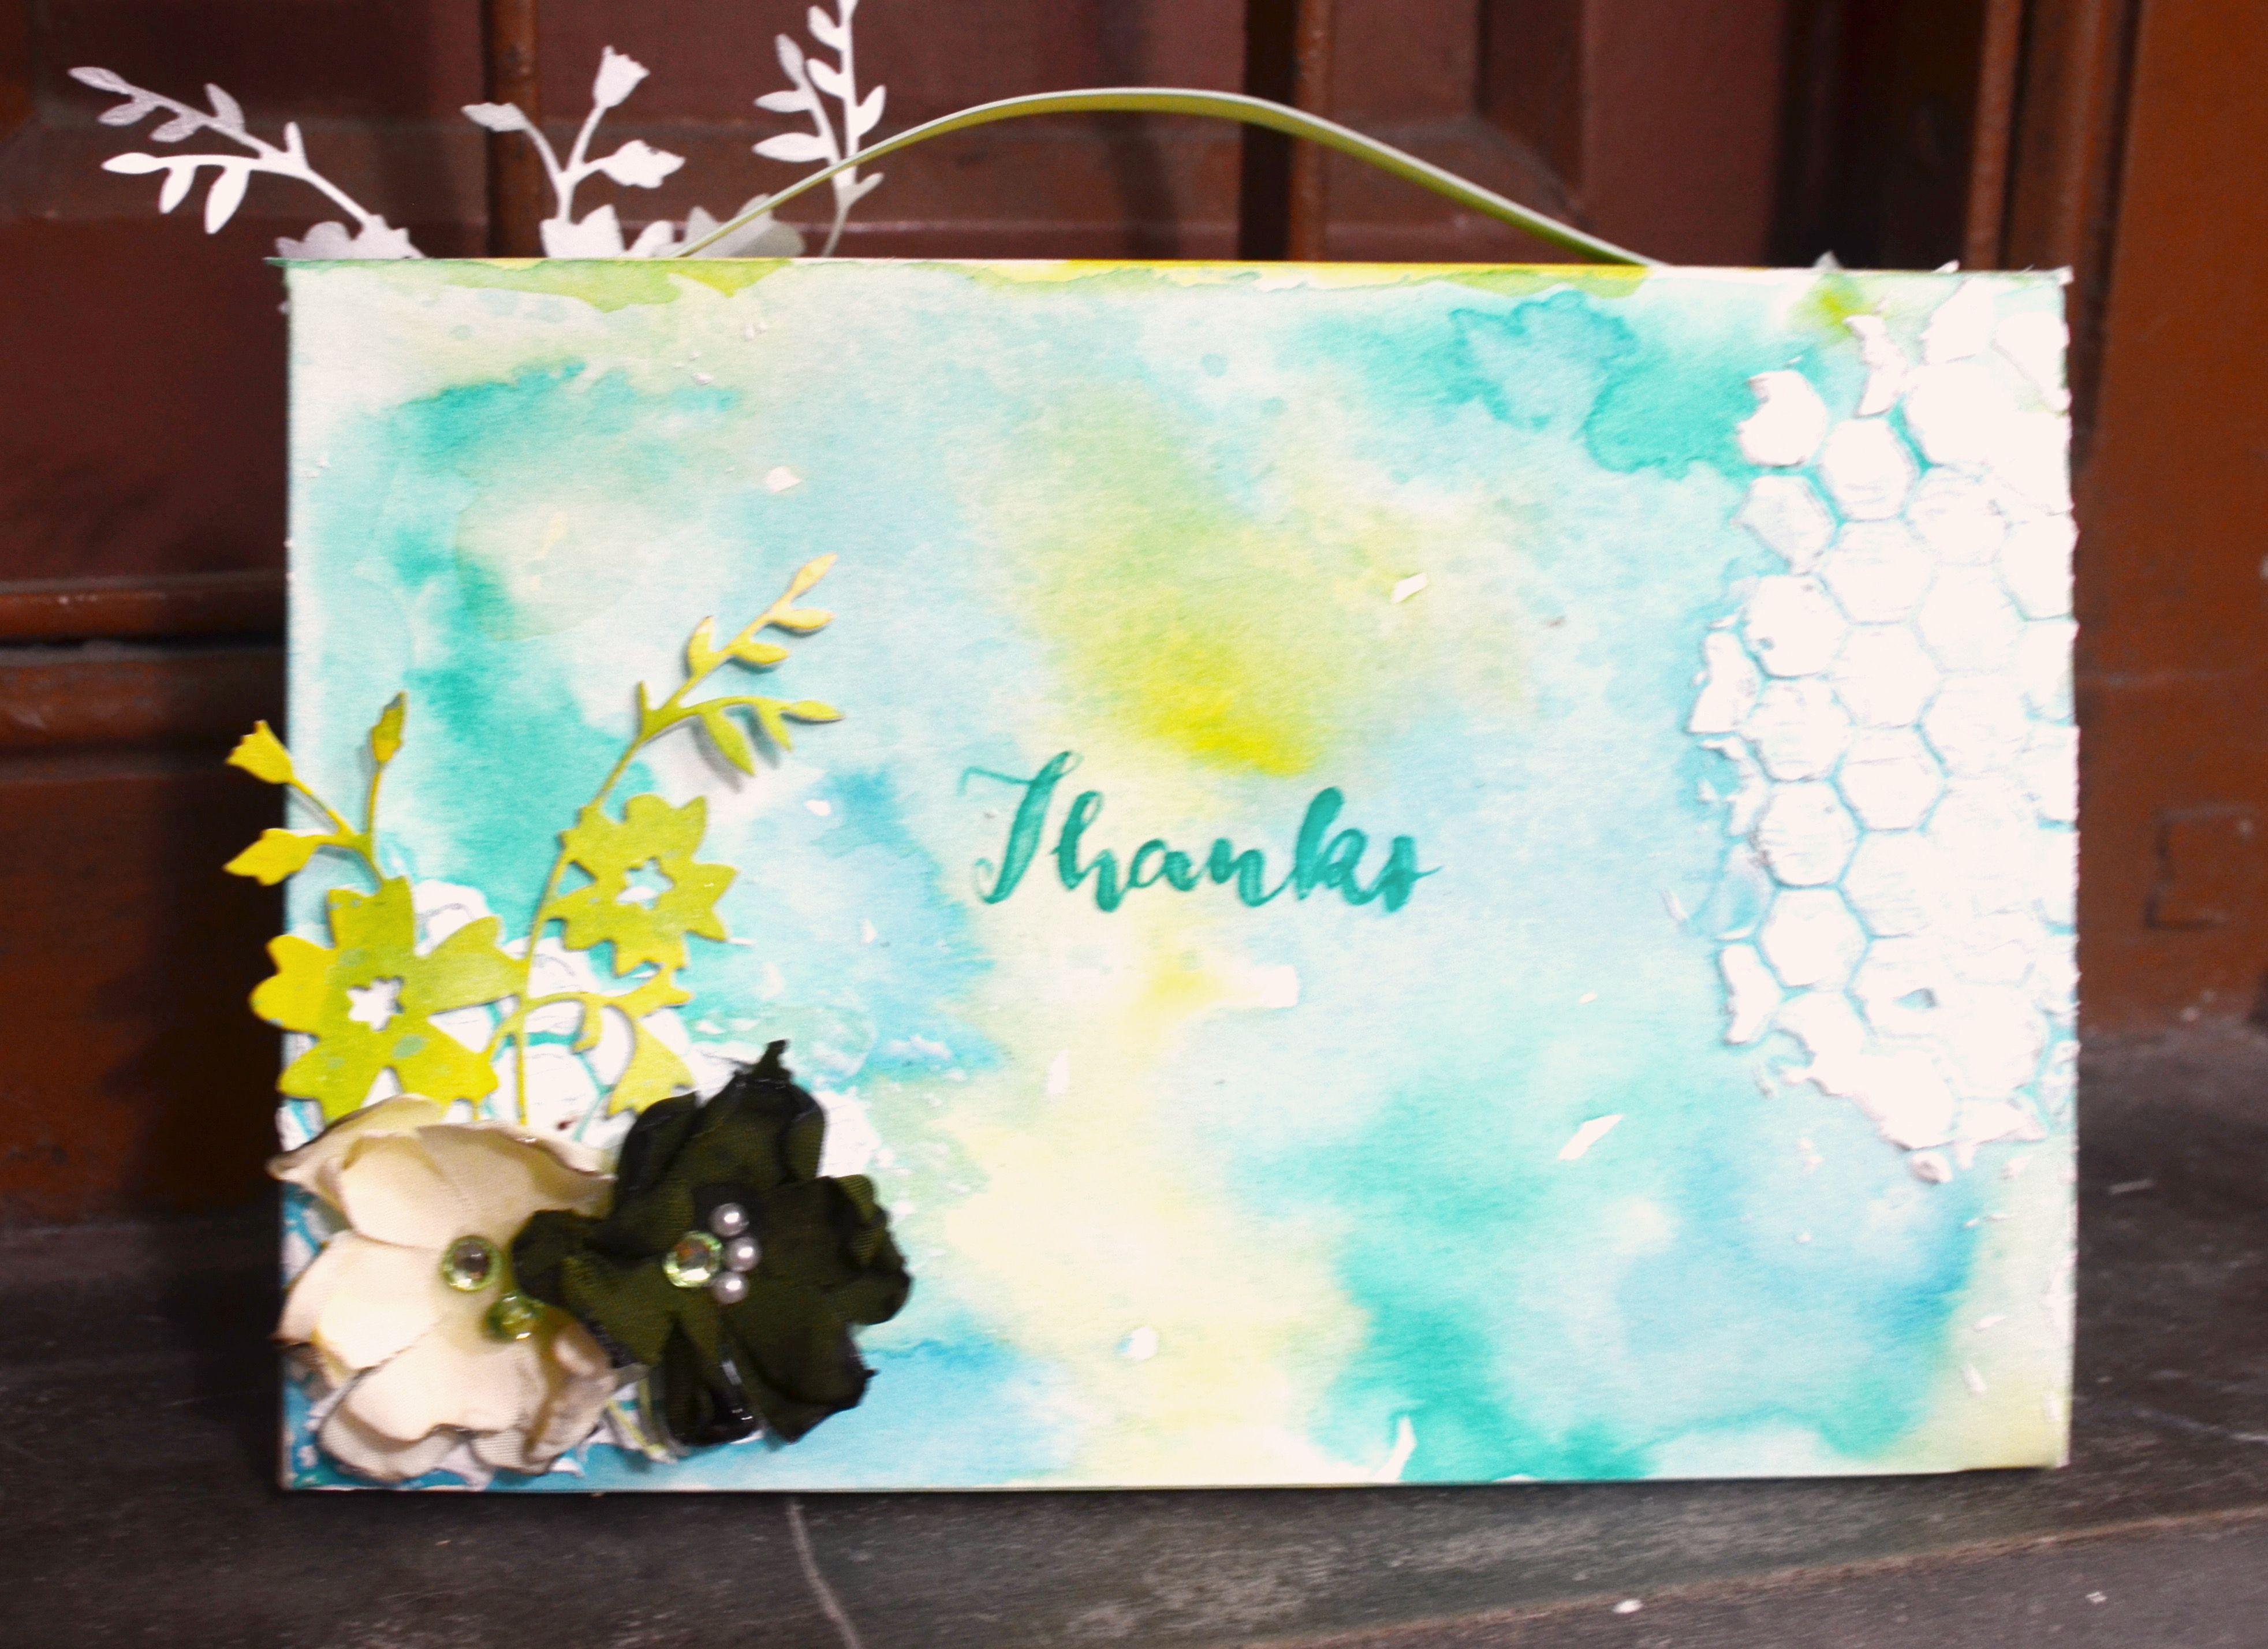 DIY flowers and watercolour paints t box geschenkschachtel scatole di regalo caja diy schőnverpackt packaging verpackung geschenk schachtel giveaway